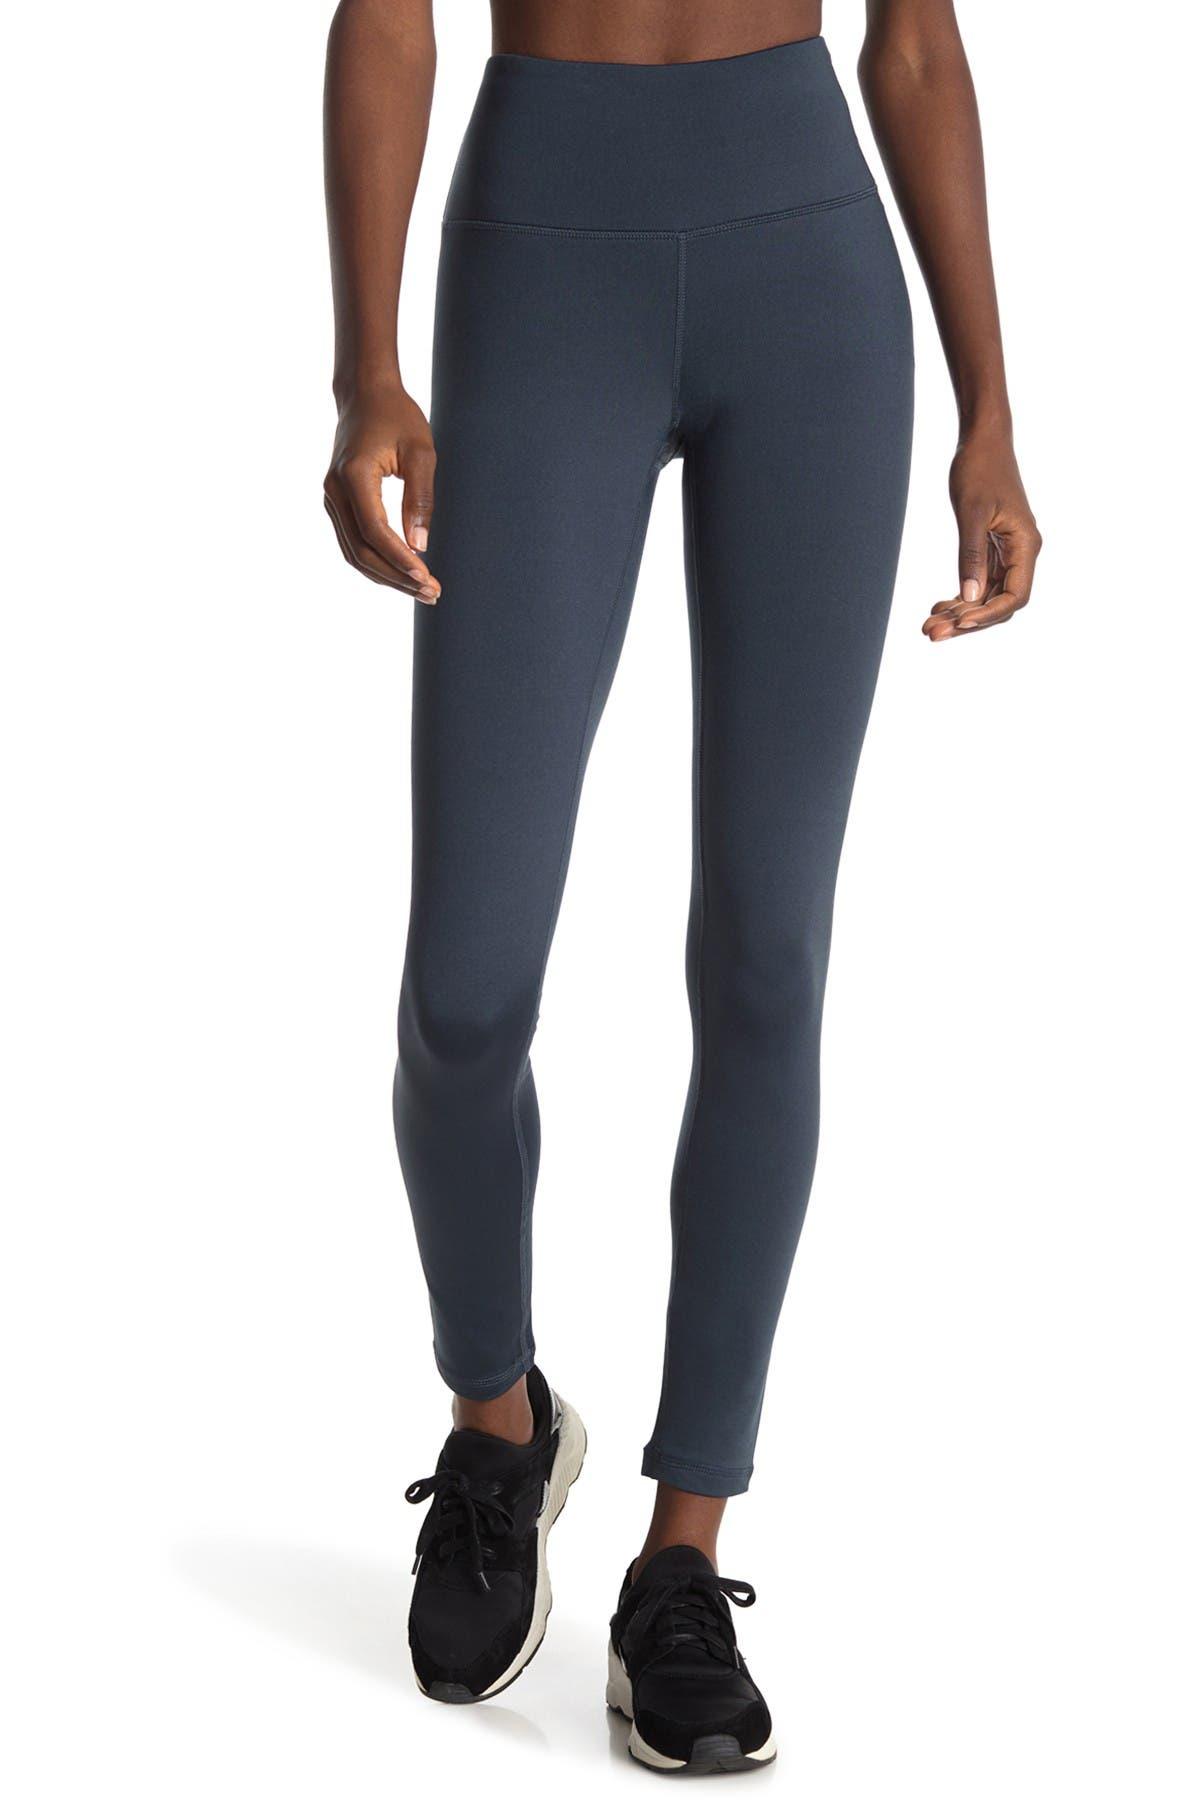 Image of 90 Degree By Reflex Soft Tech Fleece Lined High Rise Leggings